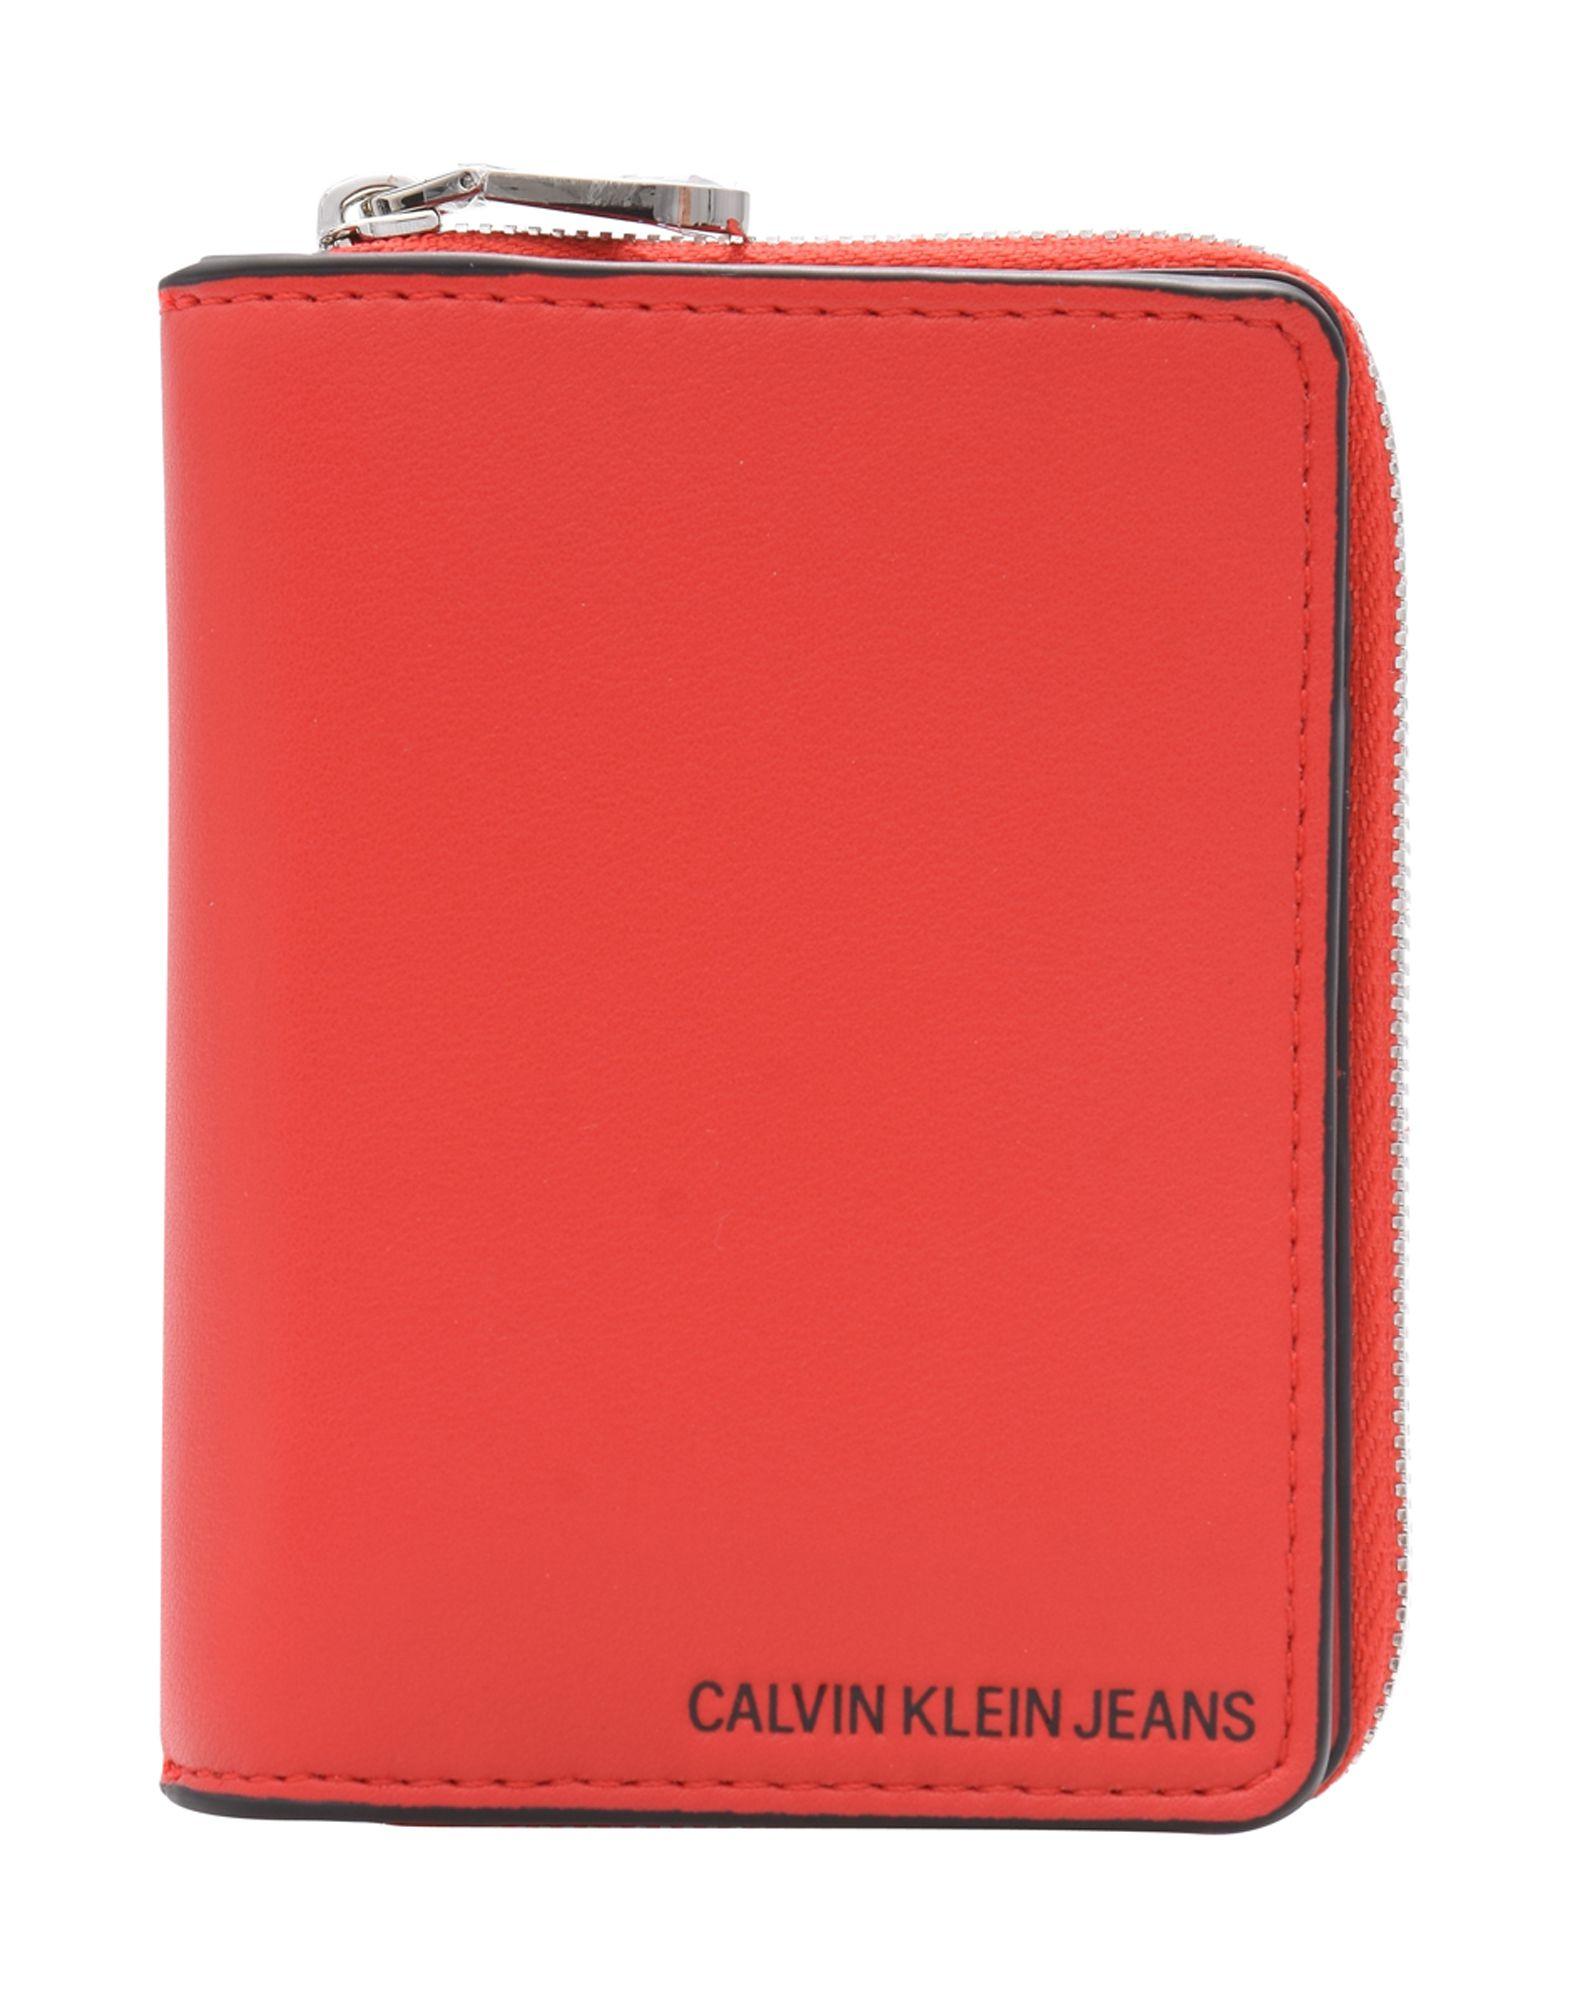 CALVIN KLEIN JEANS Бумажник calvin klein бумажник